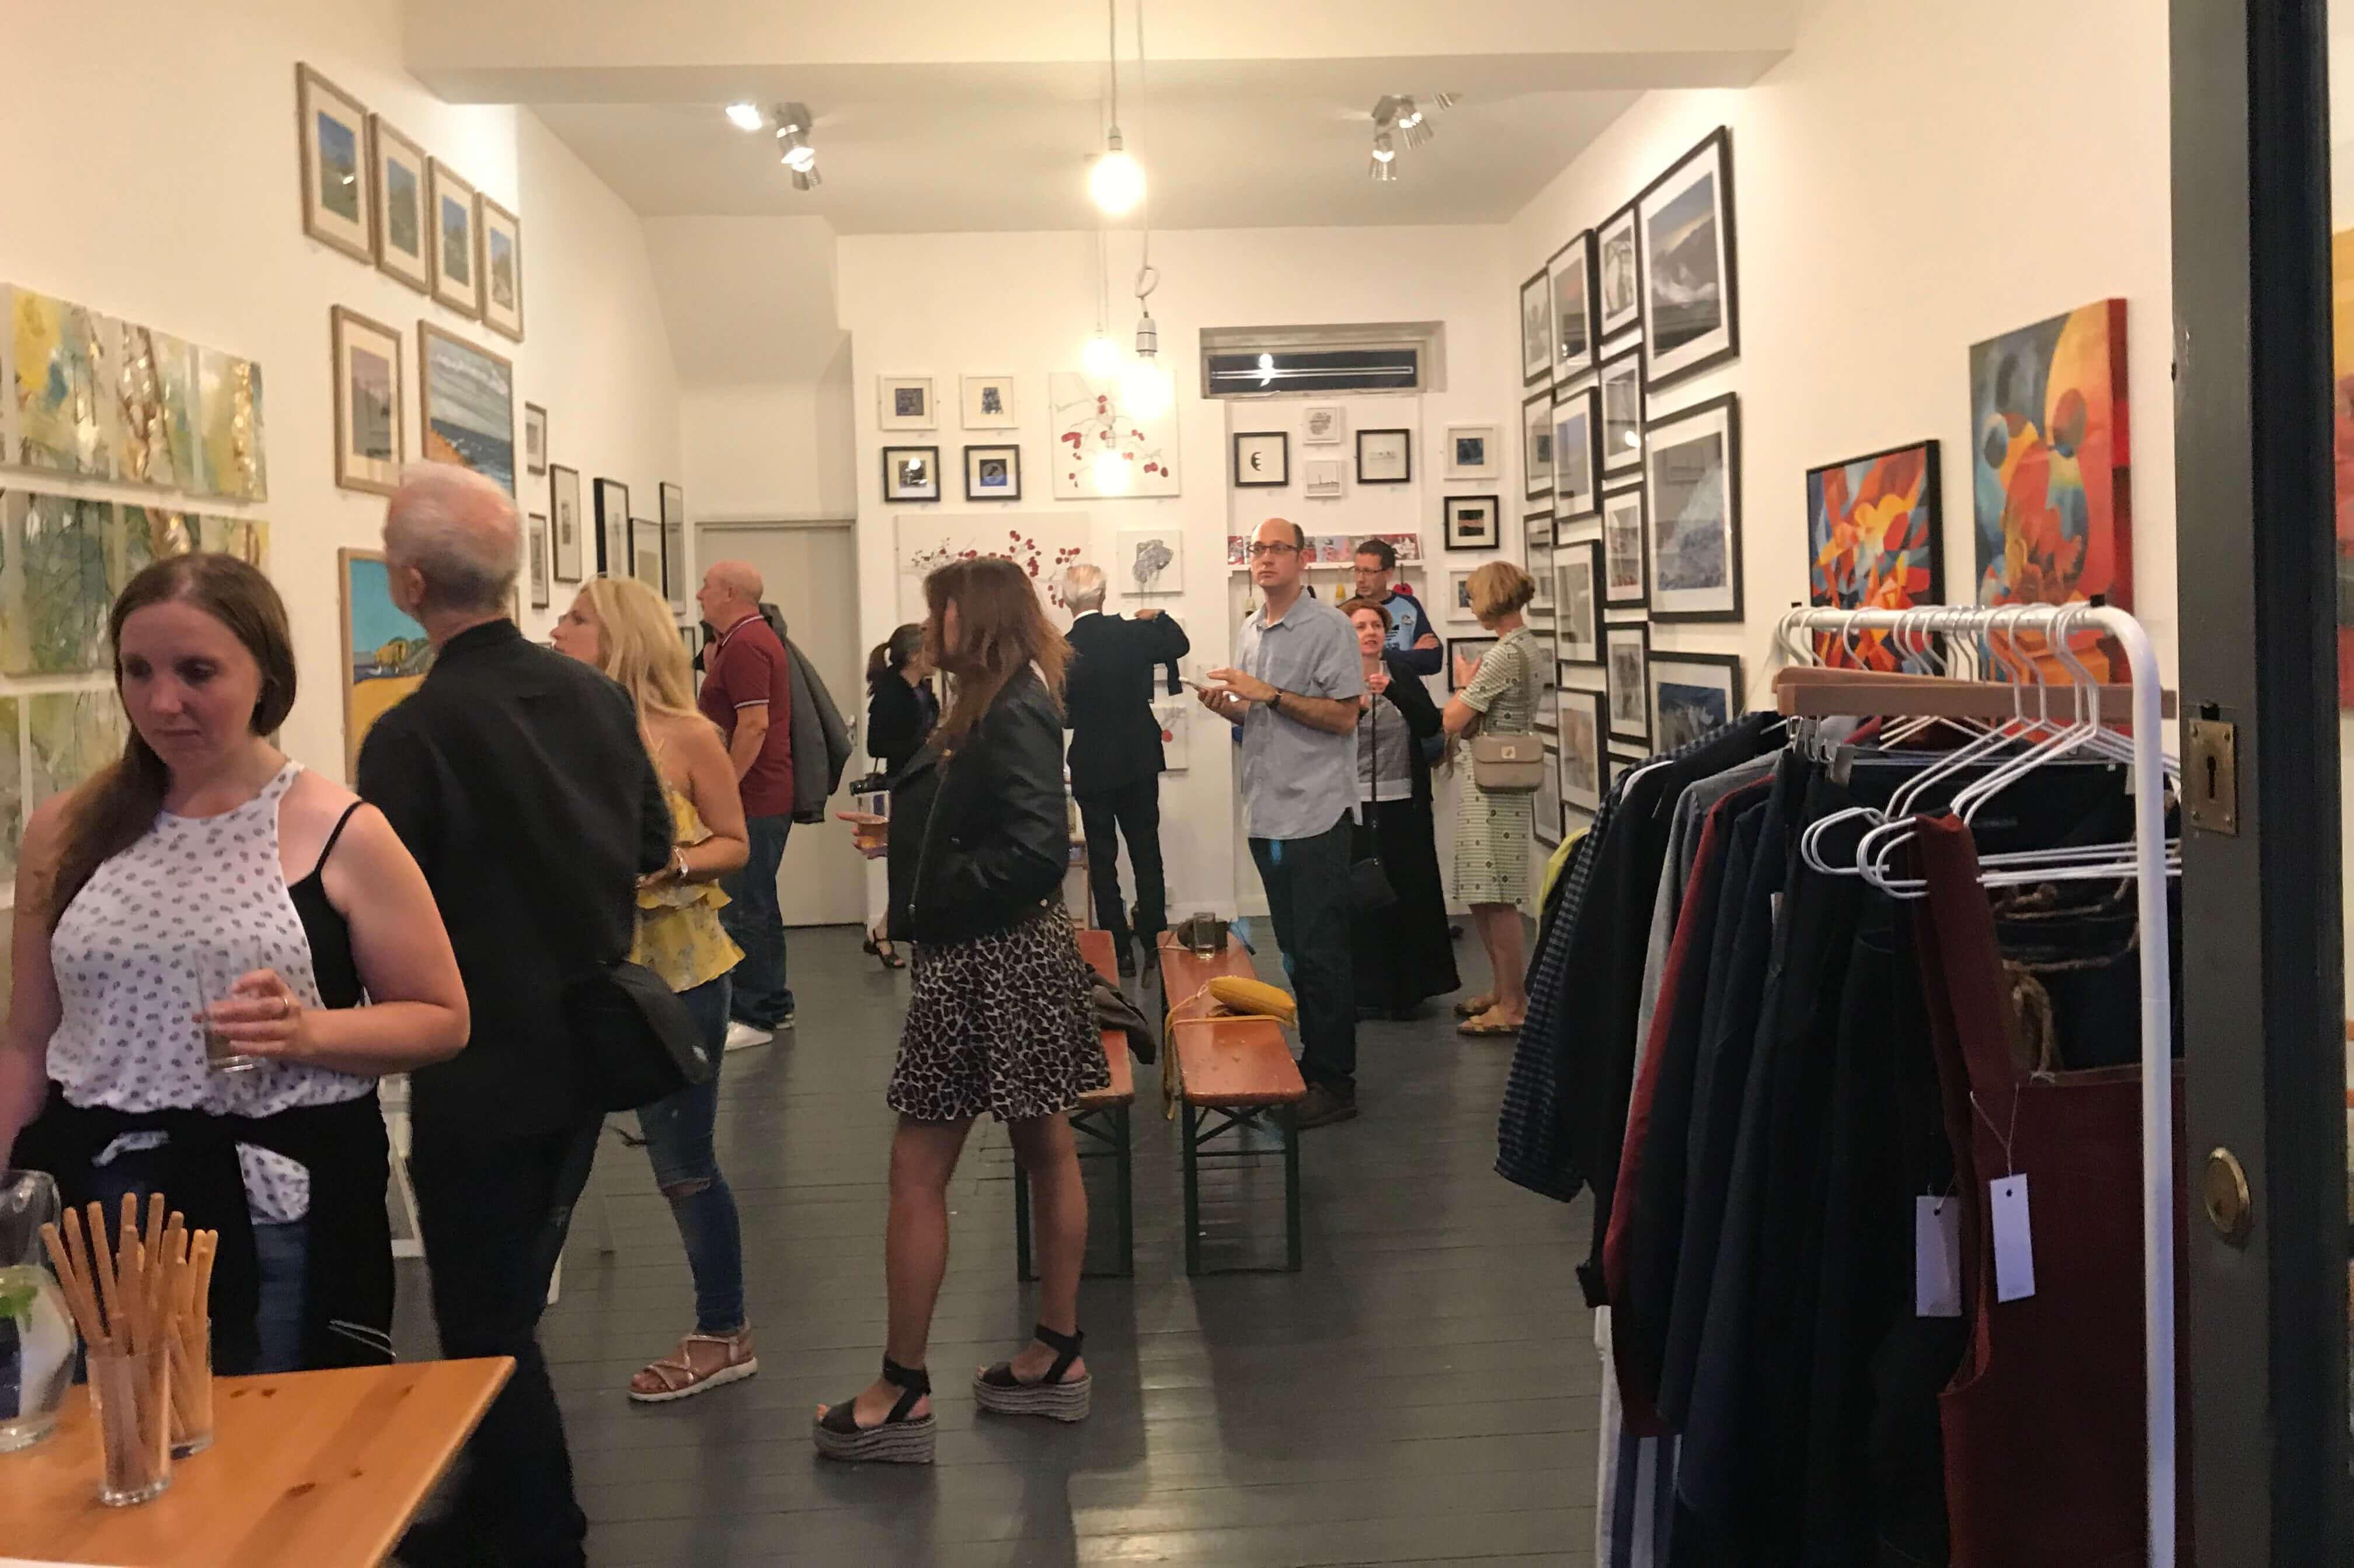 Siméon Artamonov at Nunhead Popup Art Show - Gallery 32 and Nunhead Art Trail 2019, from 20/09/2019 to 19/10/2019